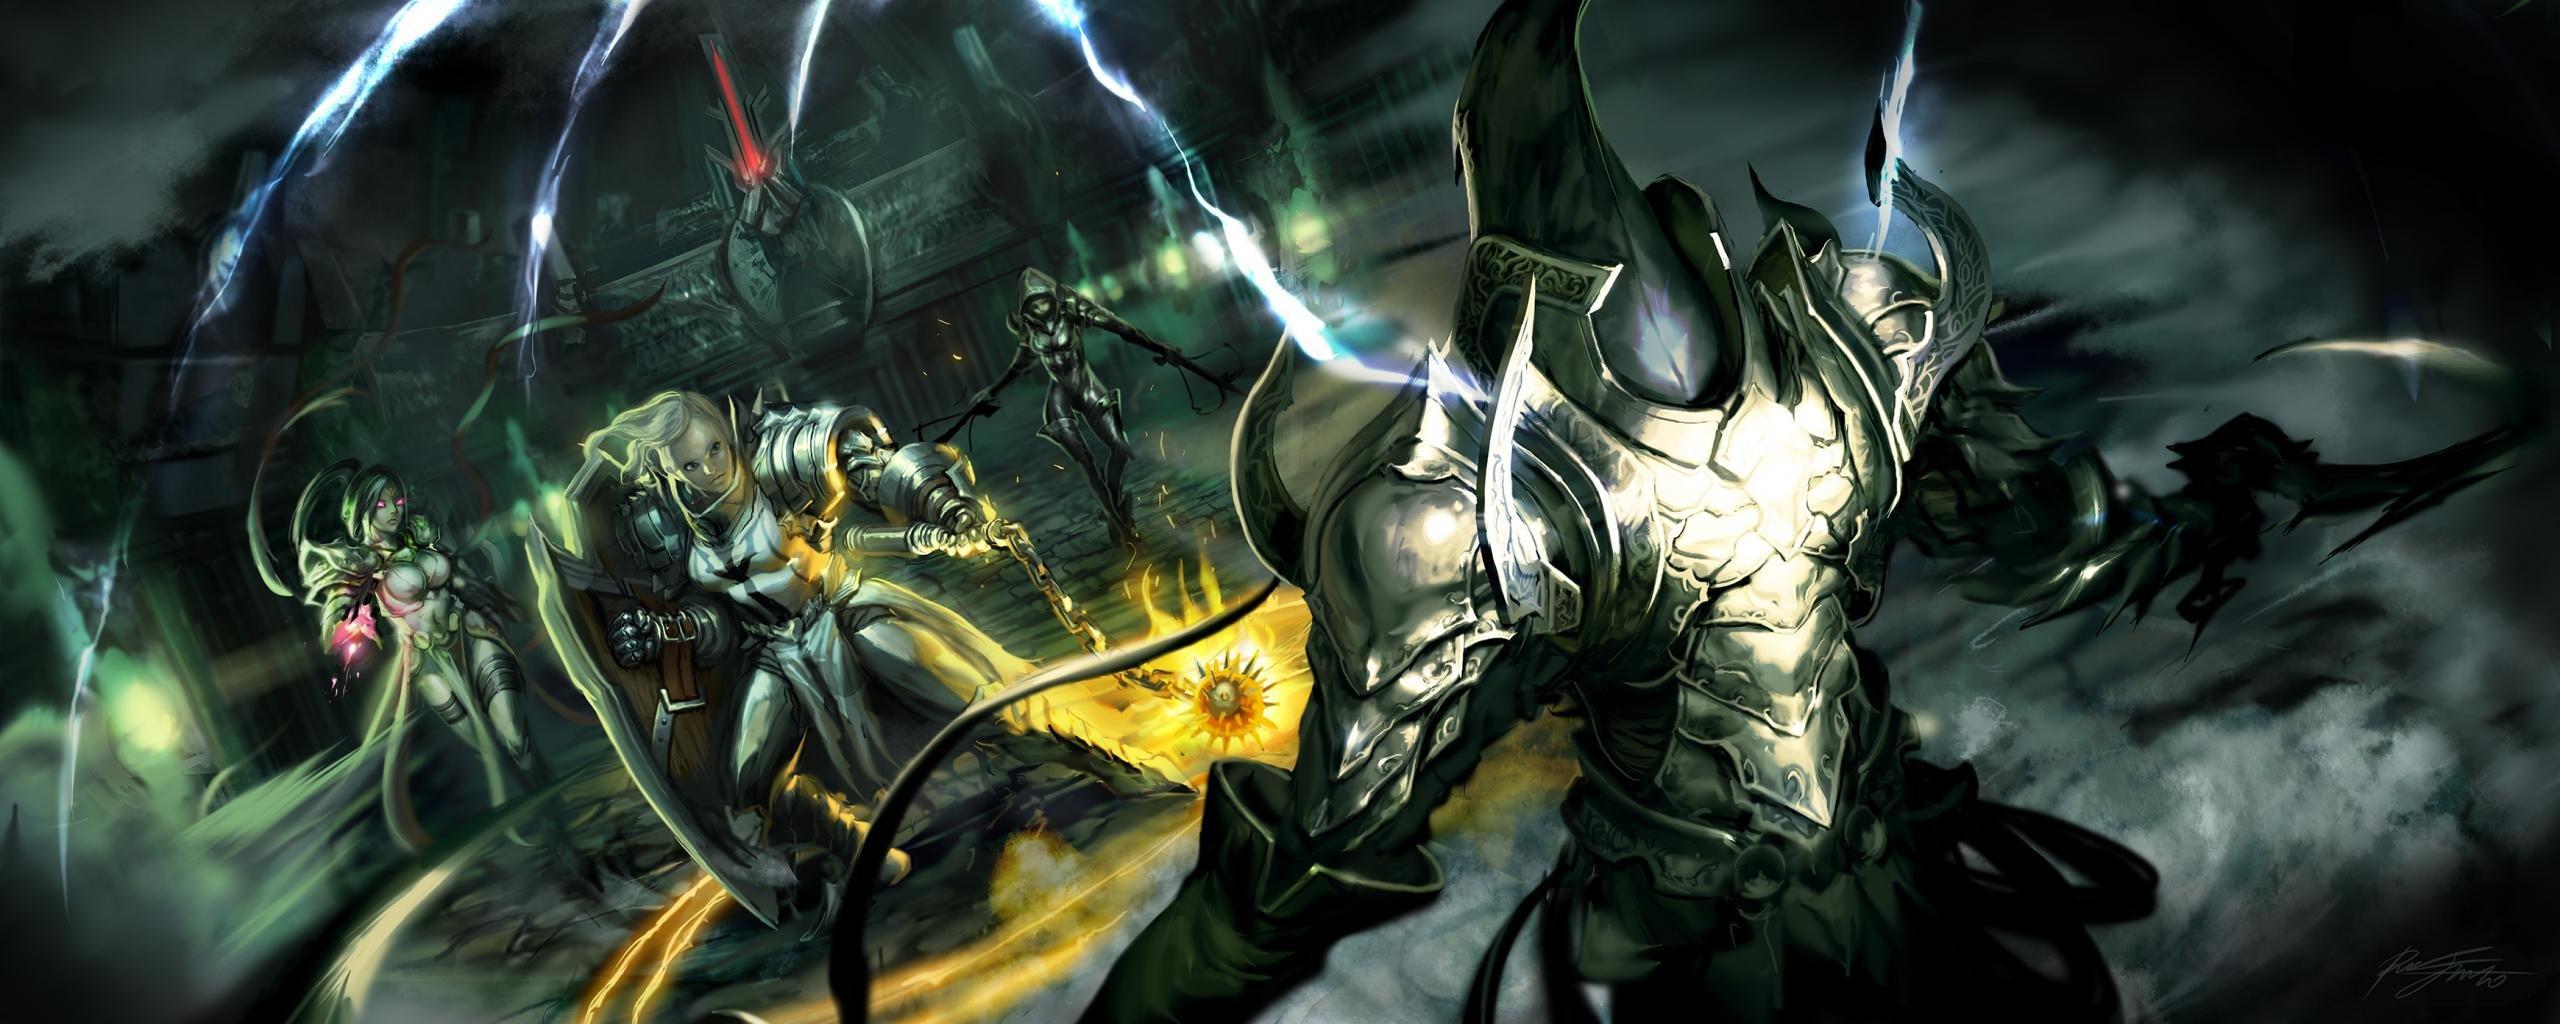 Demon Hunter Diablo 3  № 1892473 загрузить